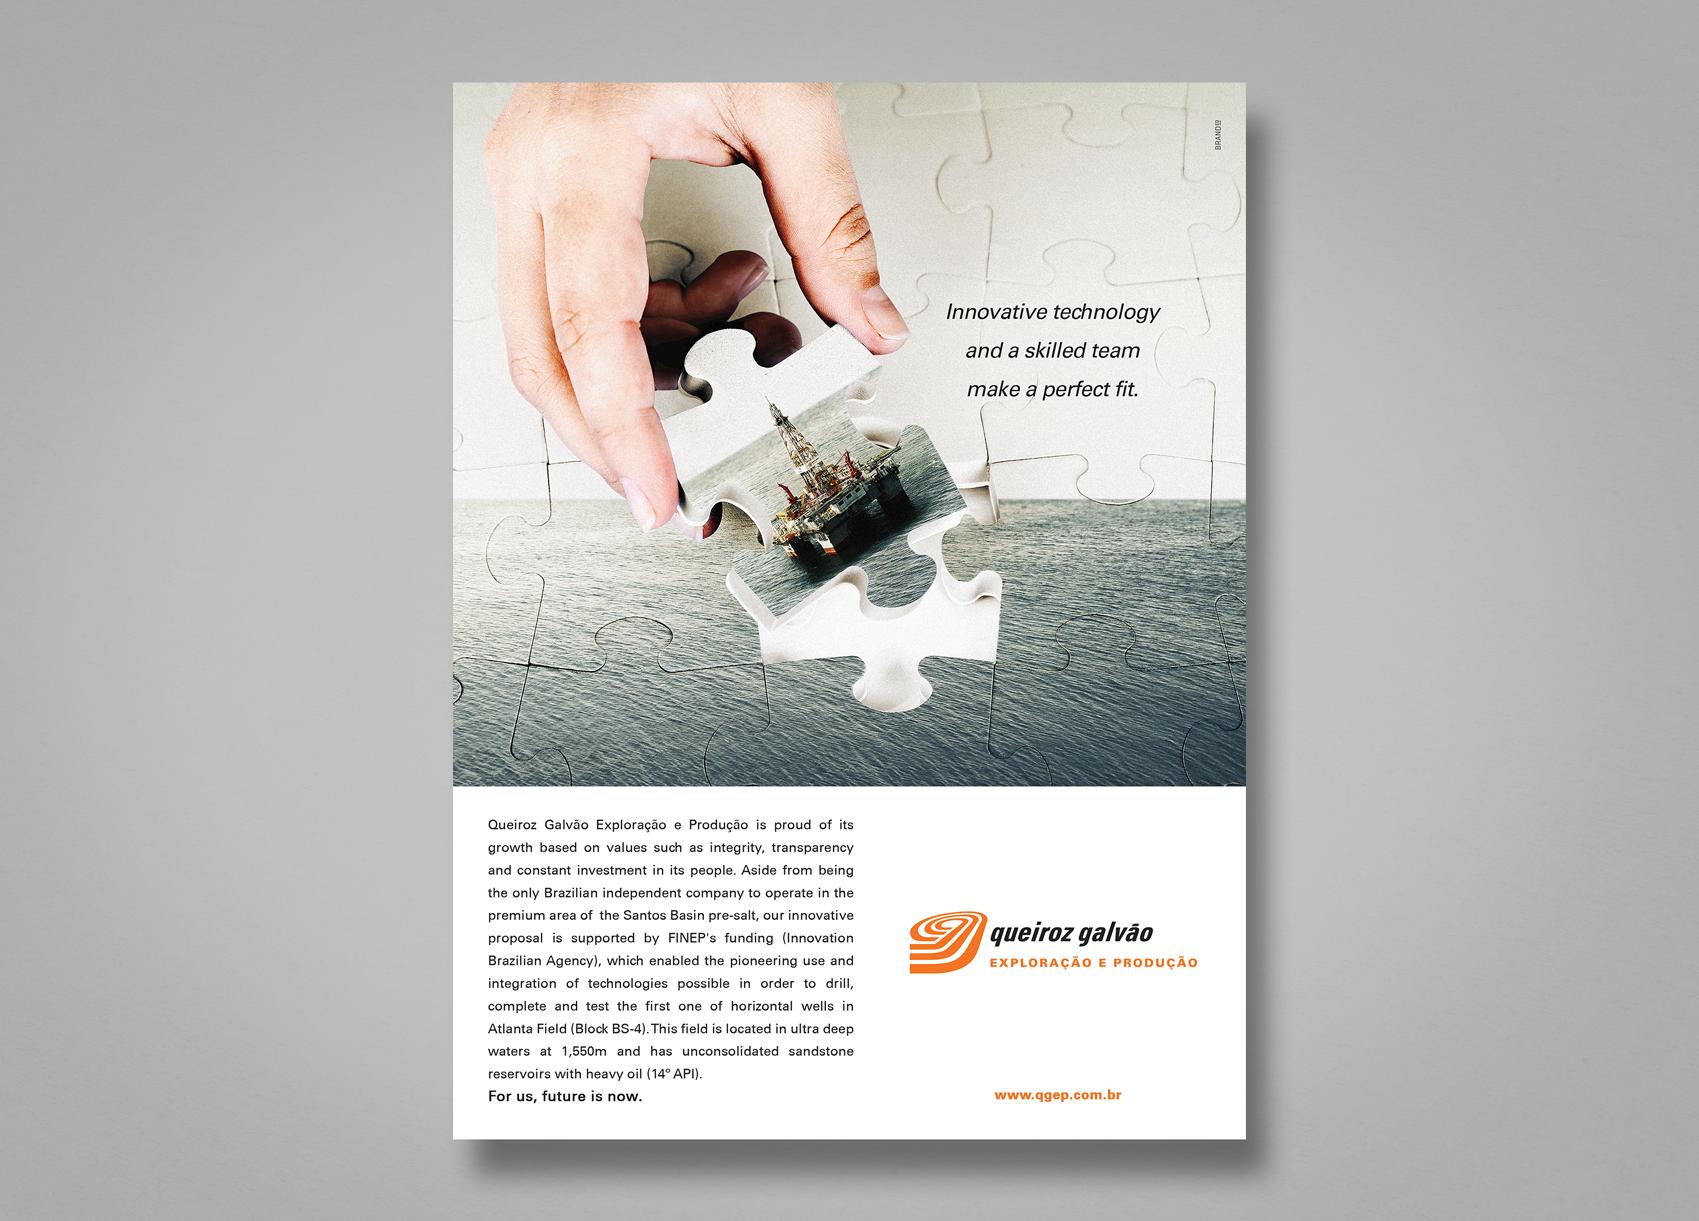 qgep_anuncio-de-revista-2